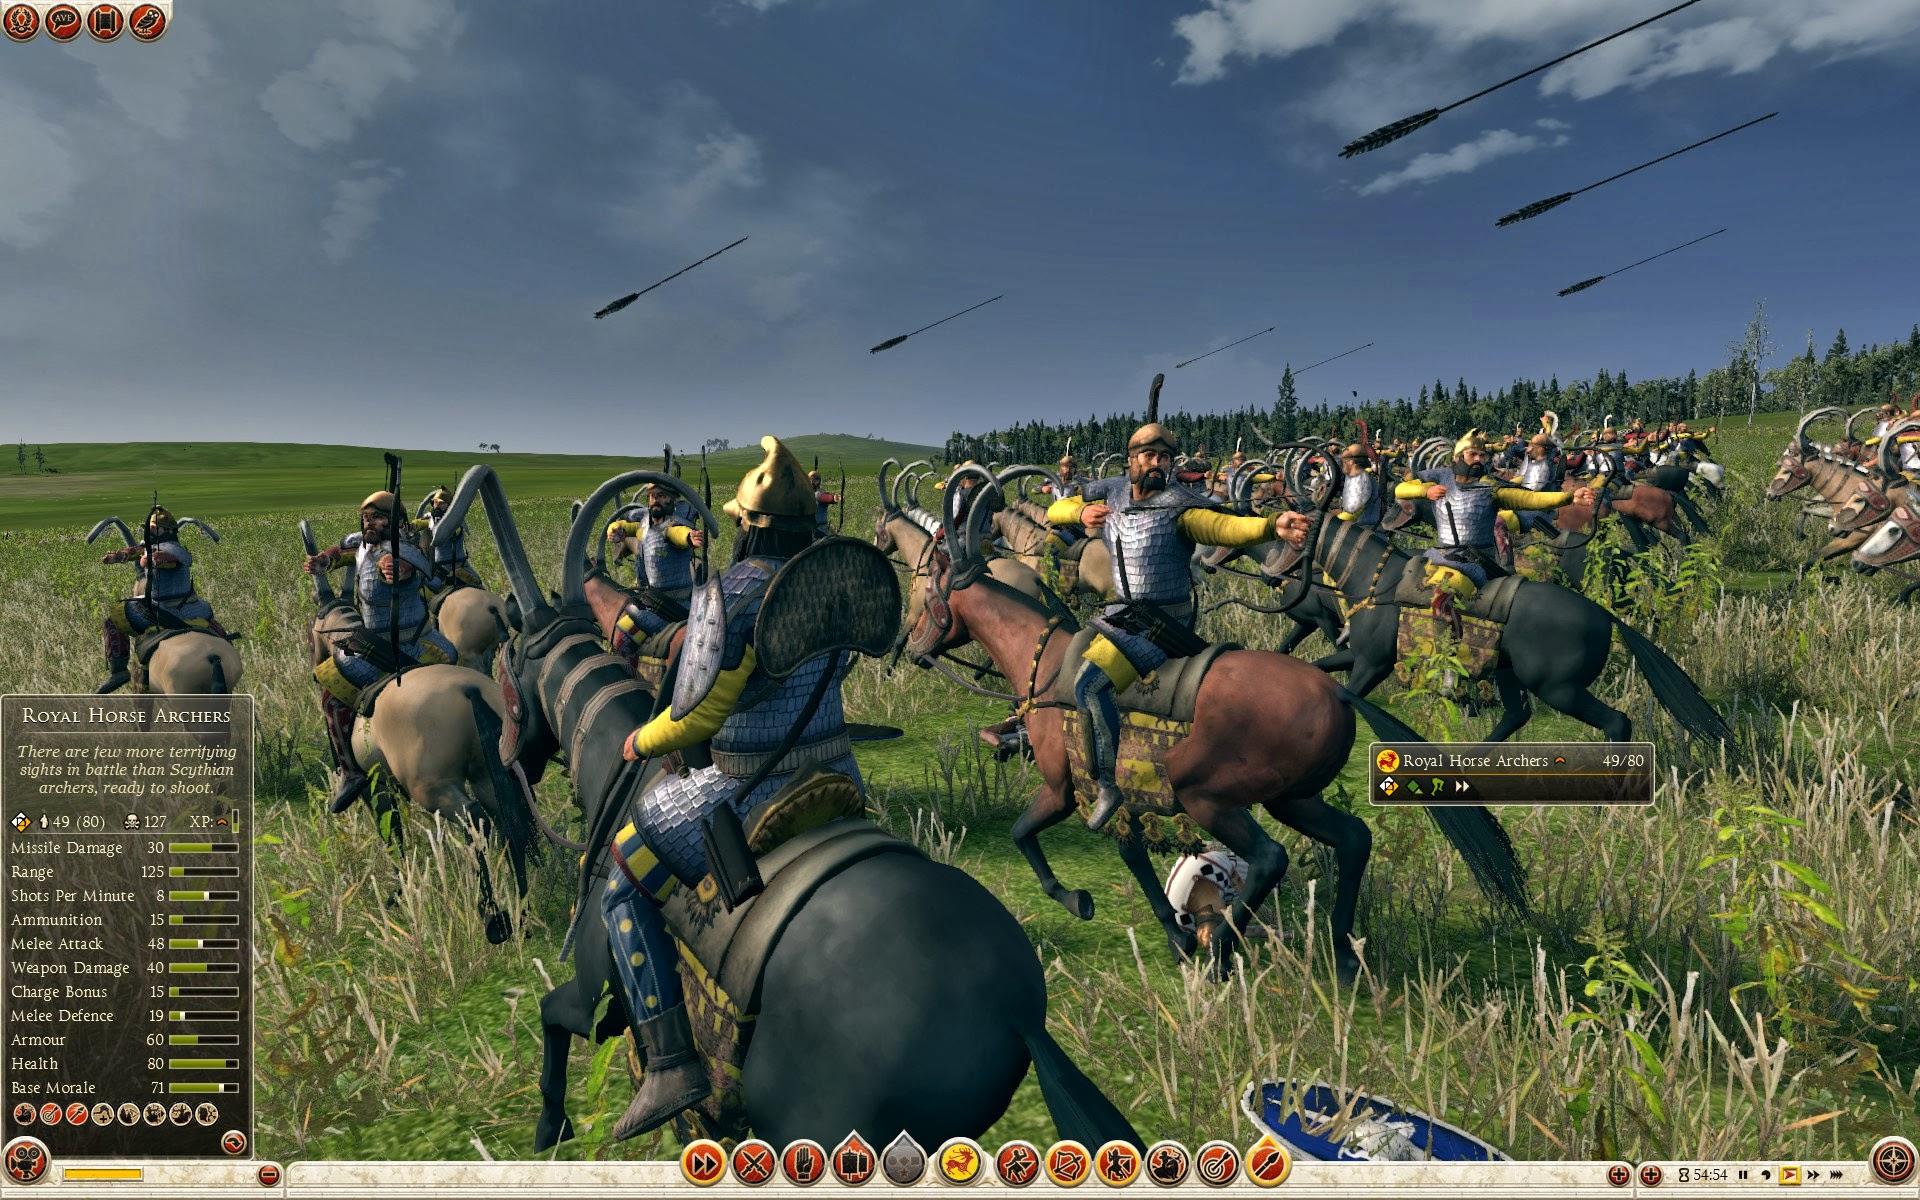 Royal Horse Archers